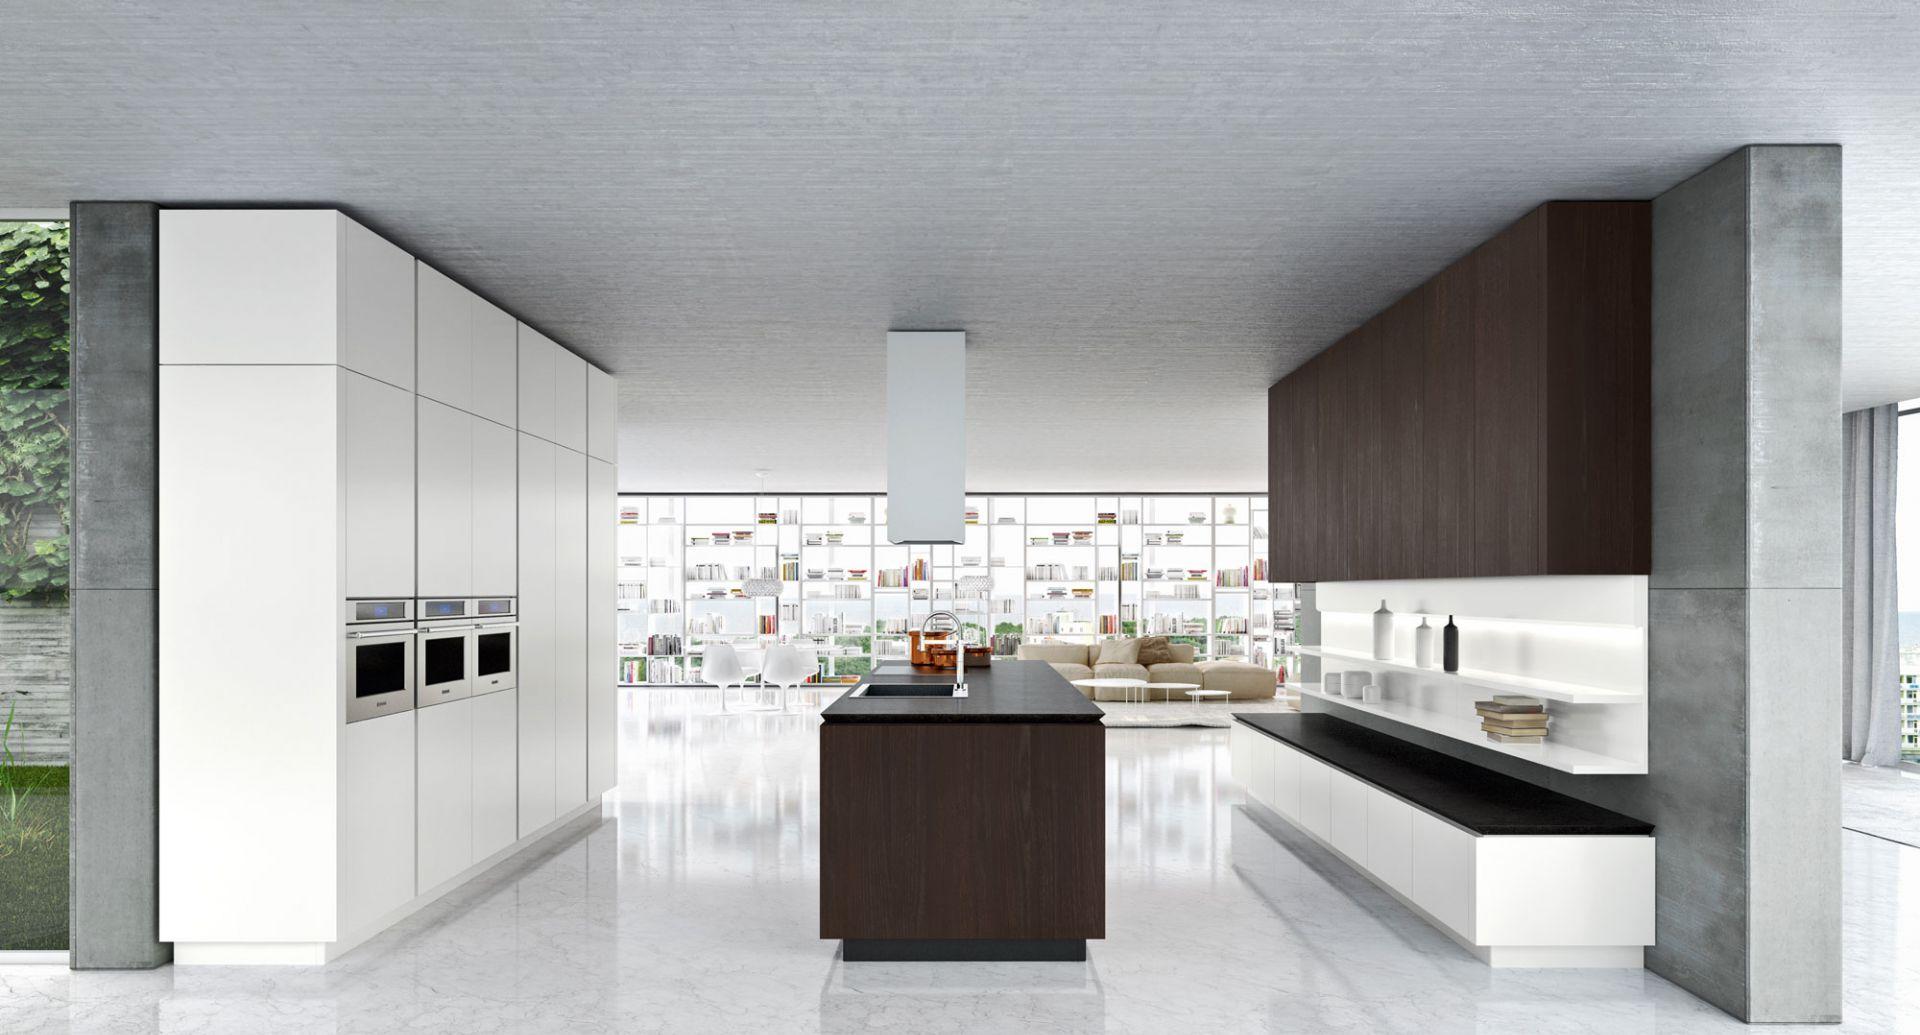 Kitchens with island Snaidero - Idea - photo 4